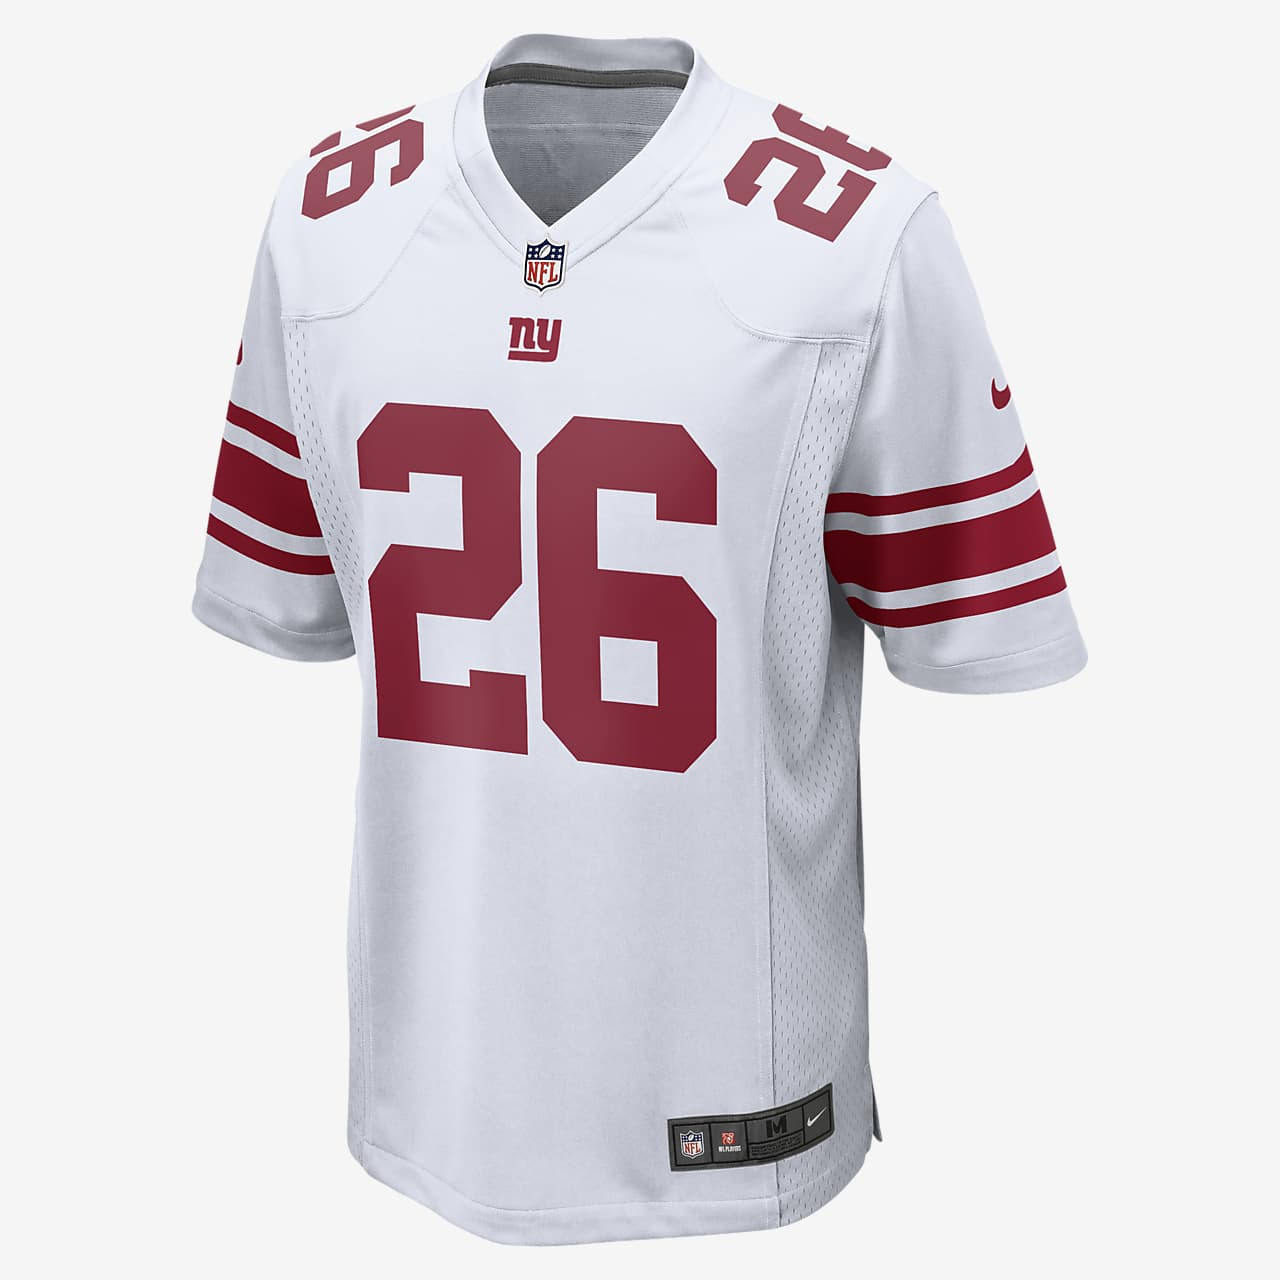 NFL New York Giants (Saquon Barkley